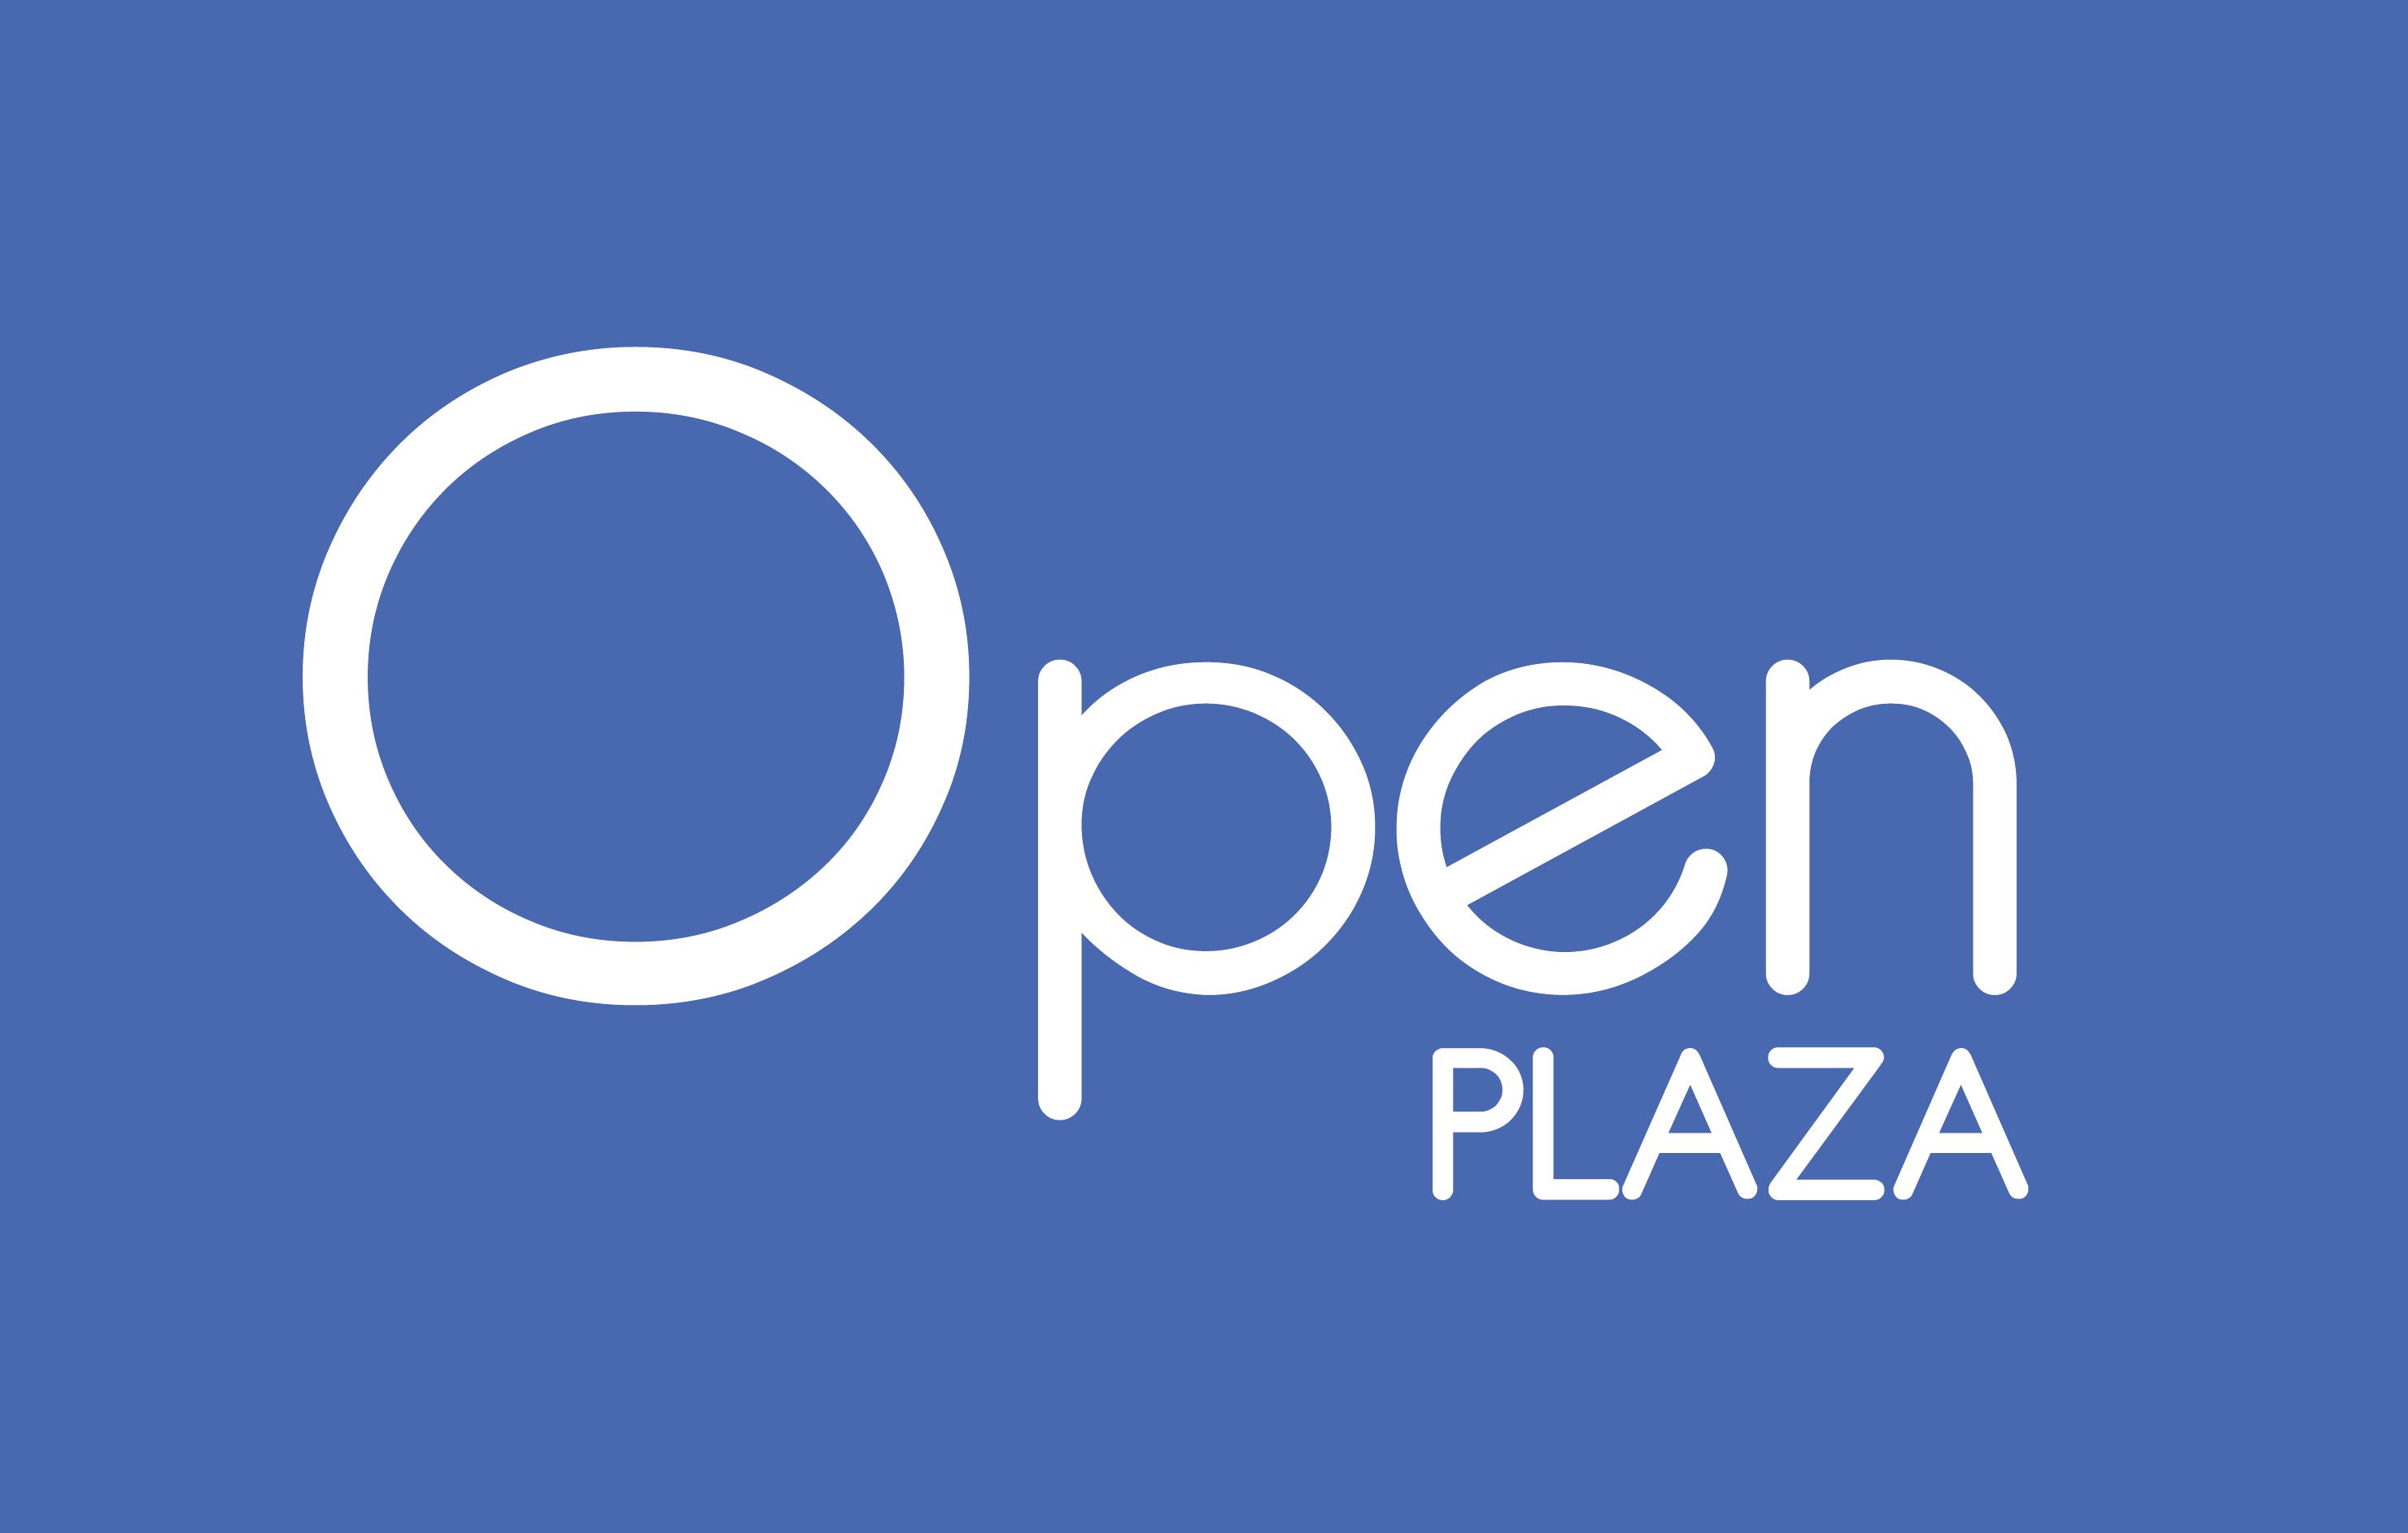 Open Plaza